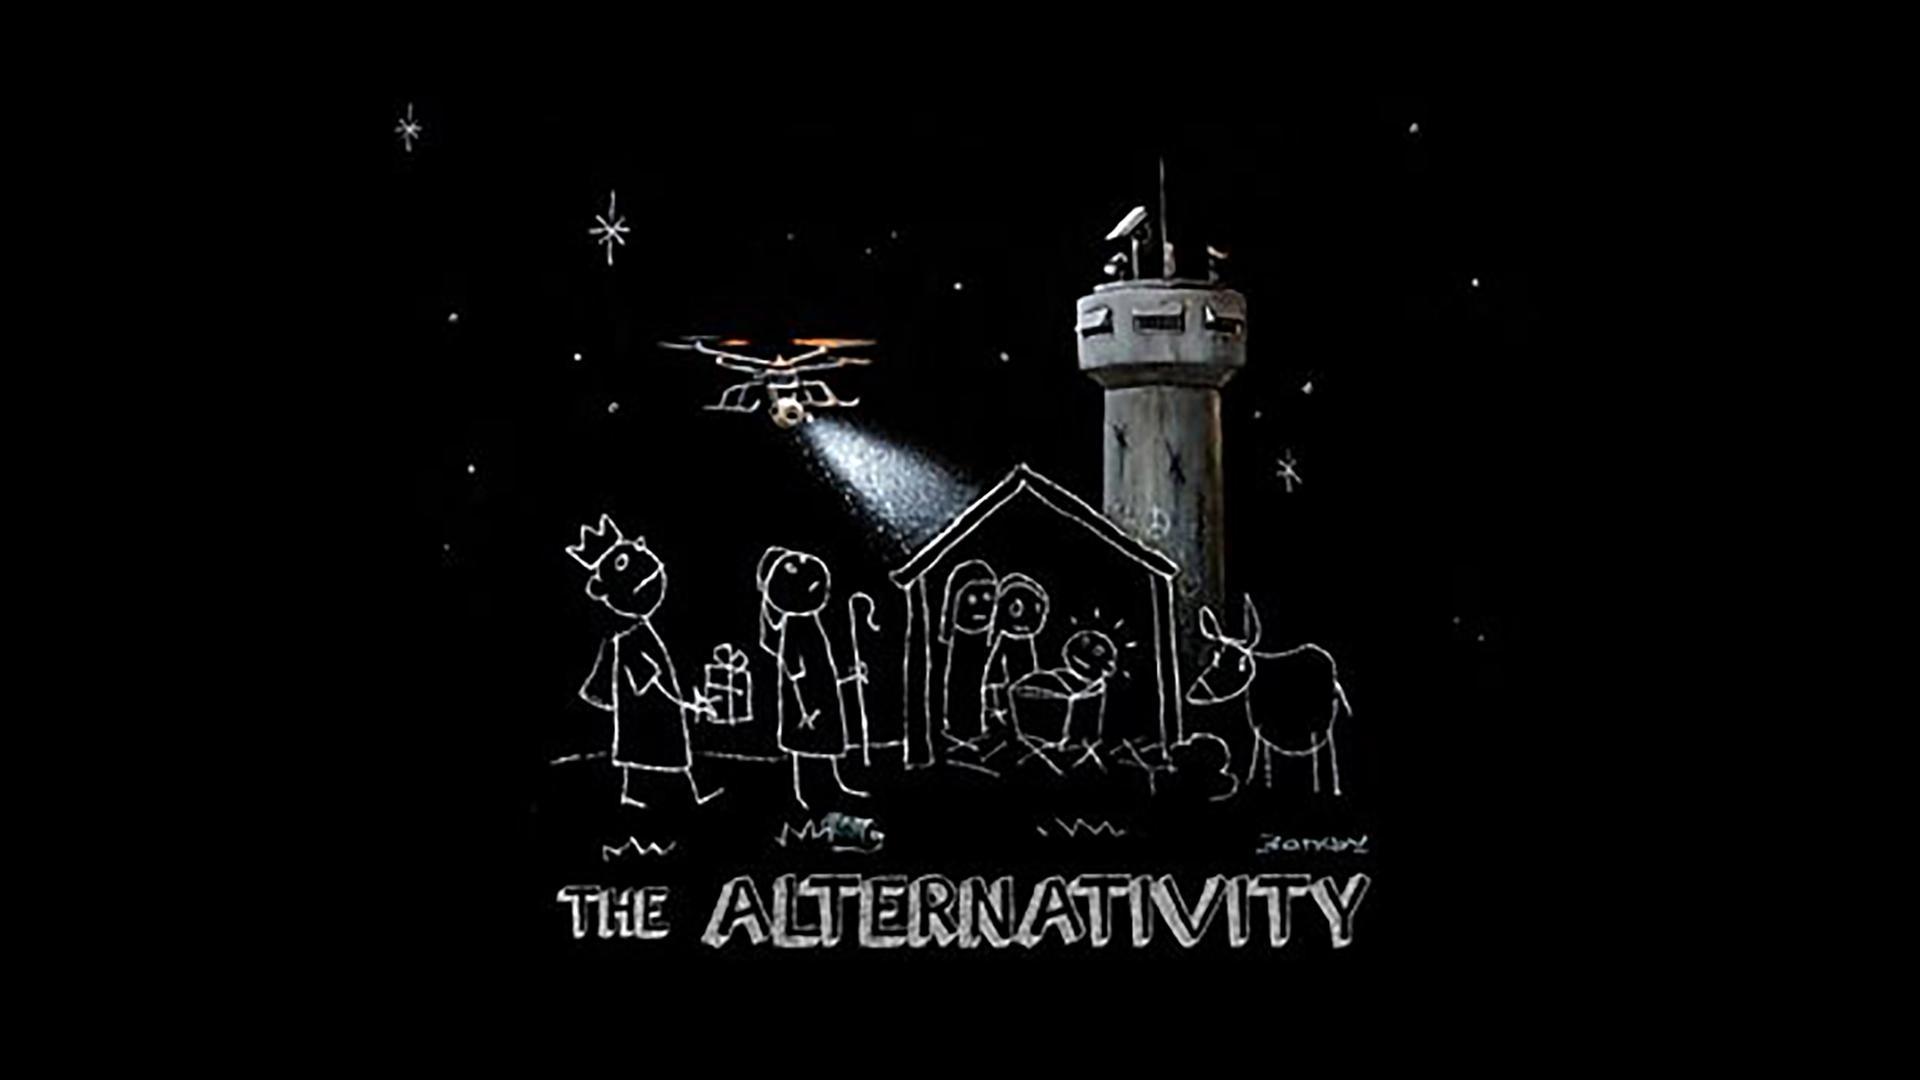 The Alternativity will air on Sunday, 17 December 2017, on BBC Two BBC/Banksy